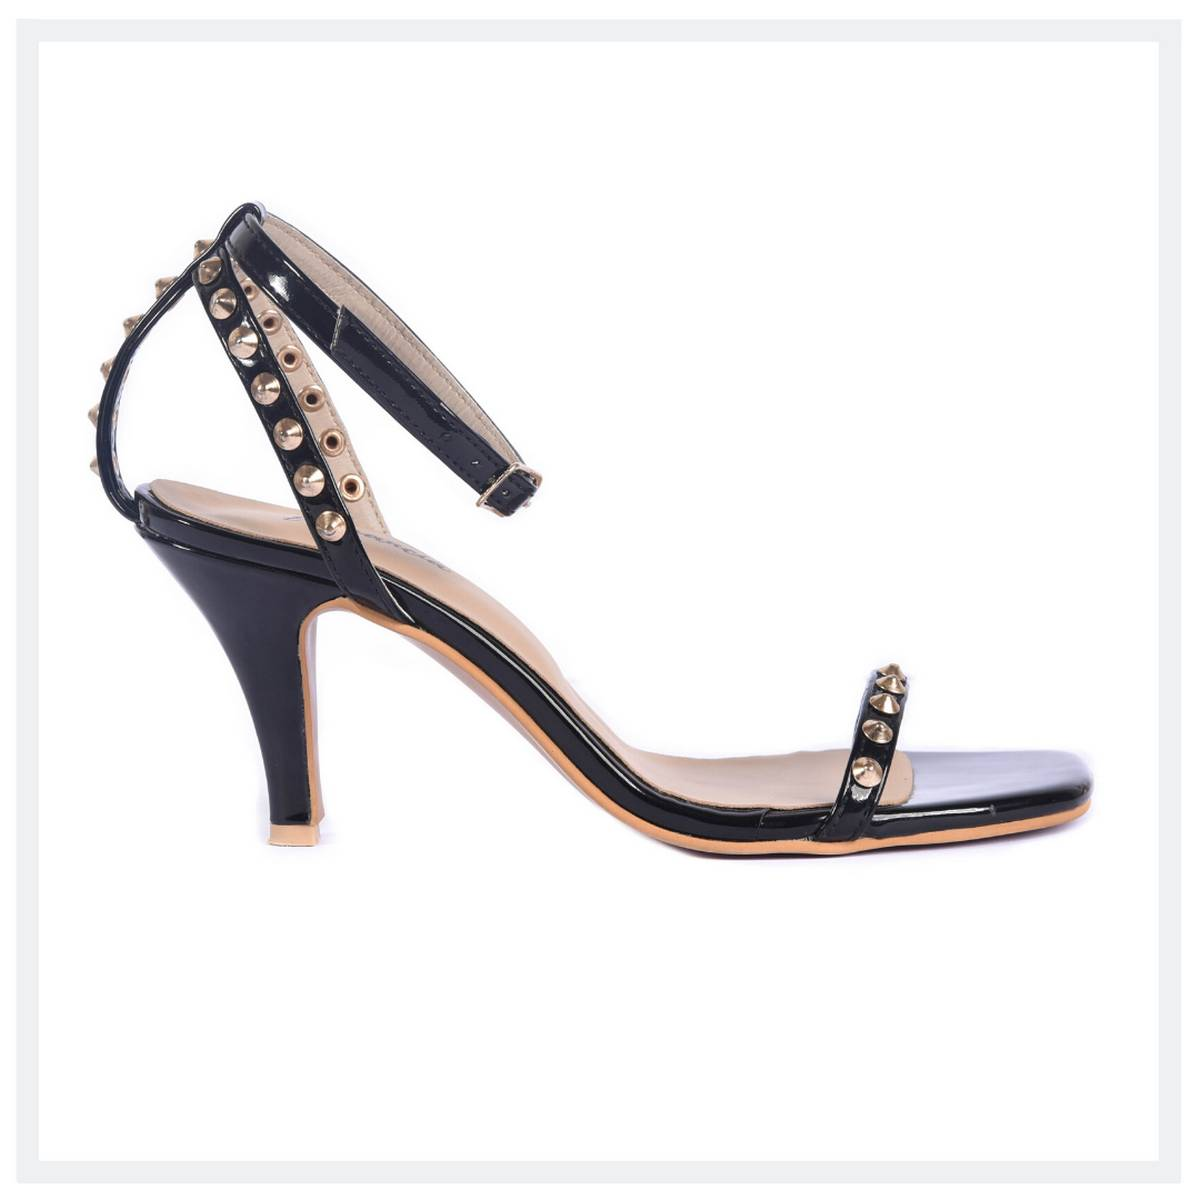 SANTORINI  Women's High Heel Sandals  Black  Elegancia